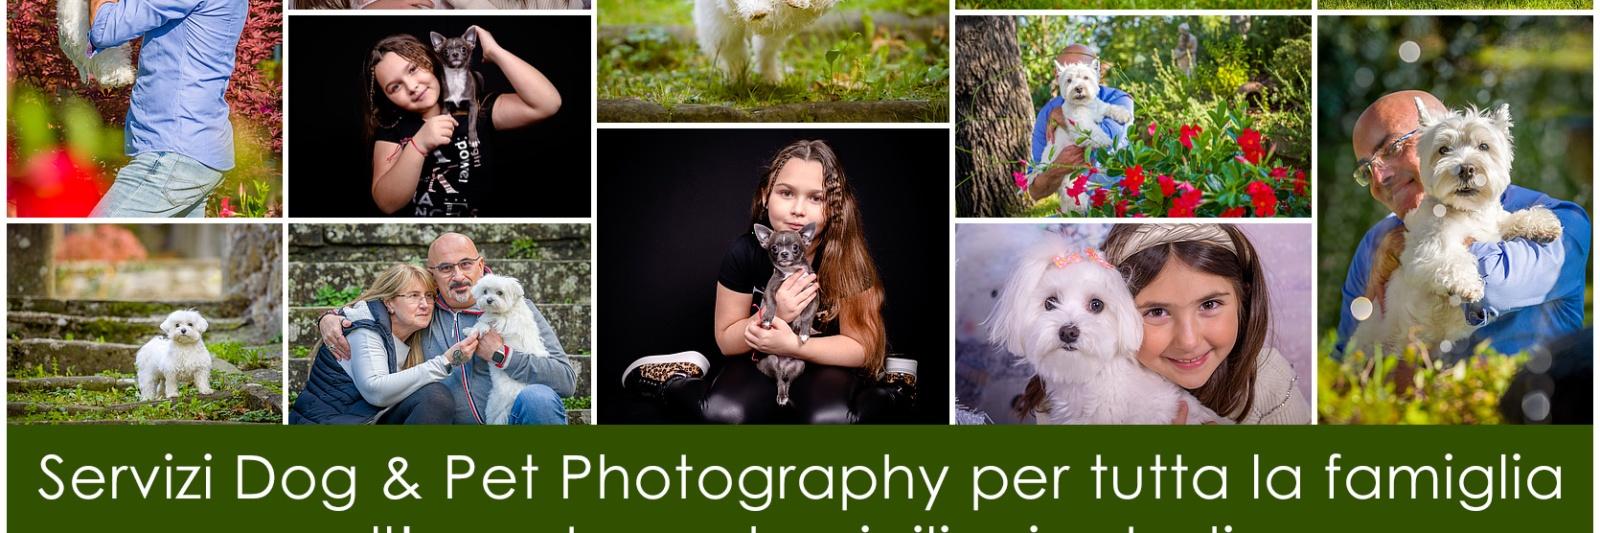 Dog & Pet Photography